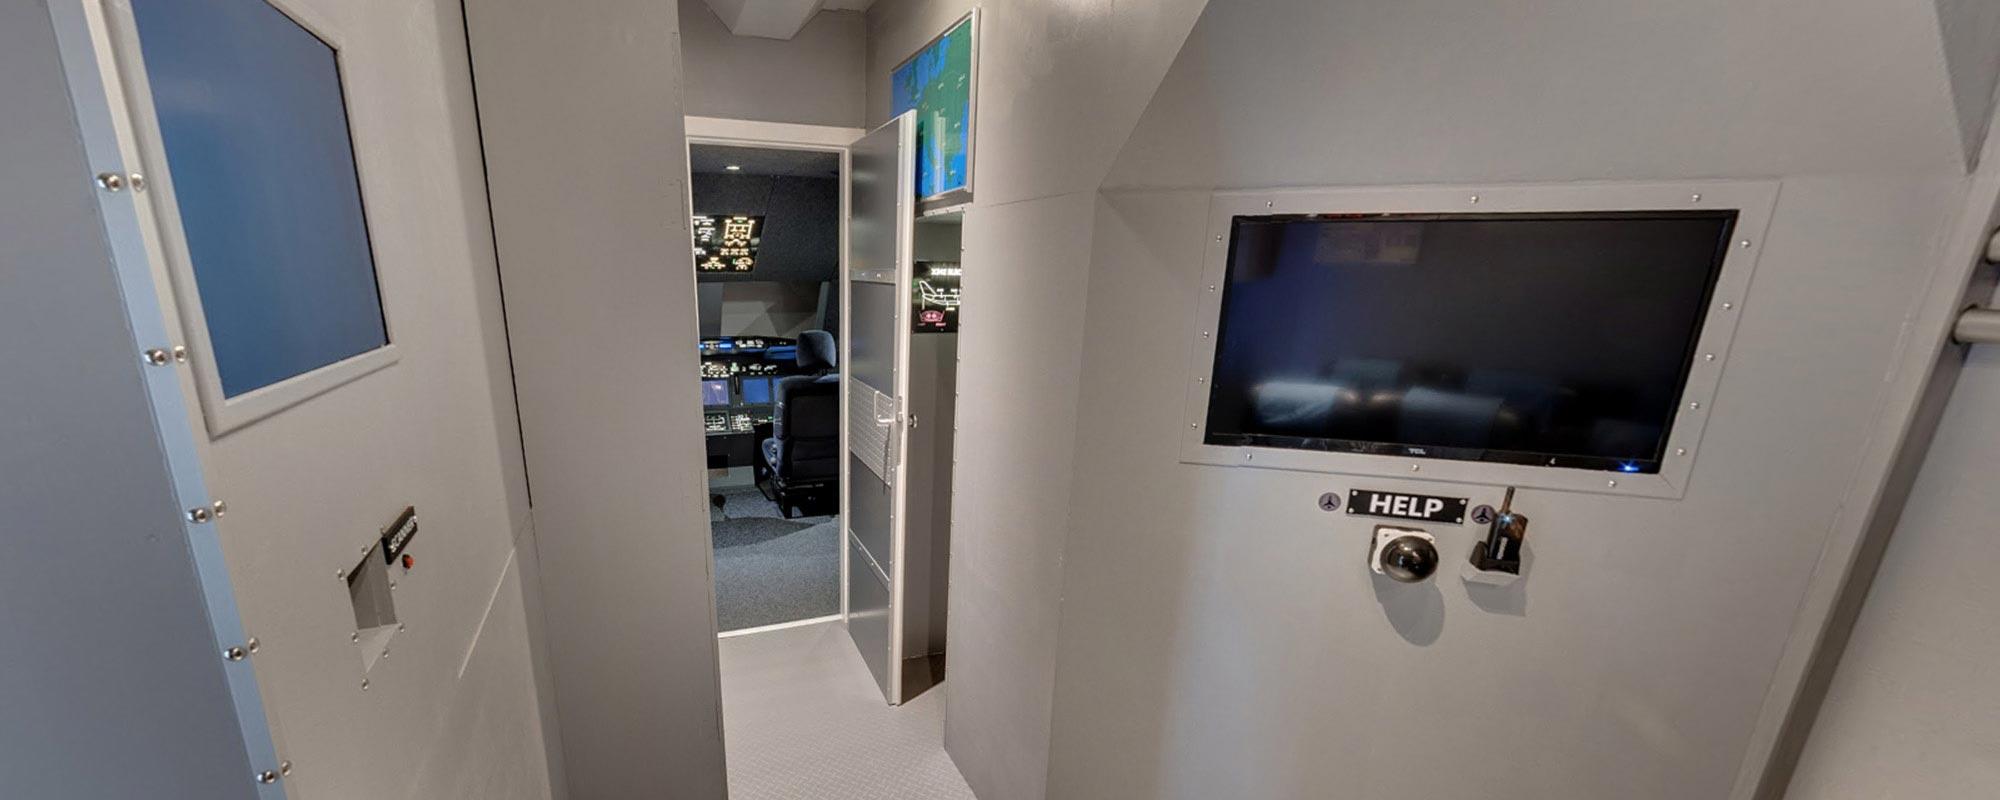 ebafkc-escaperoom-2000x800-04